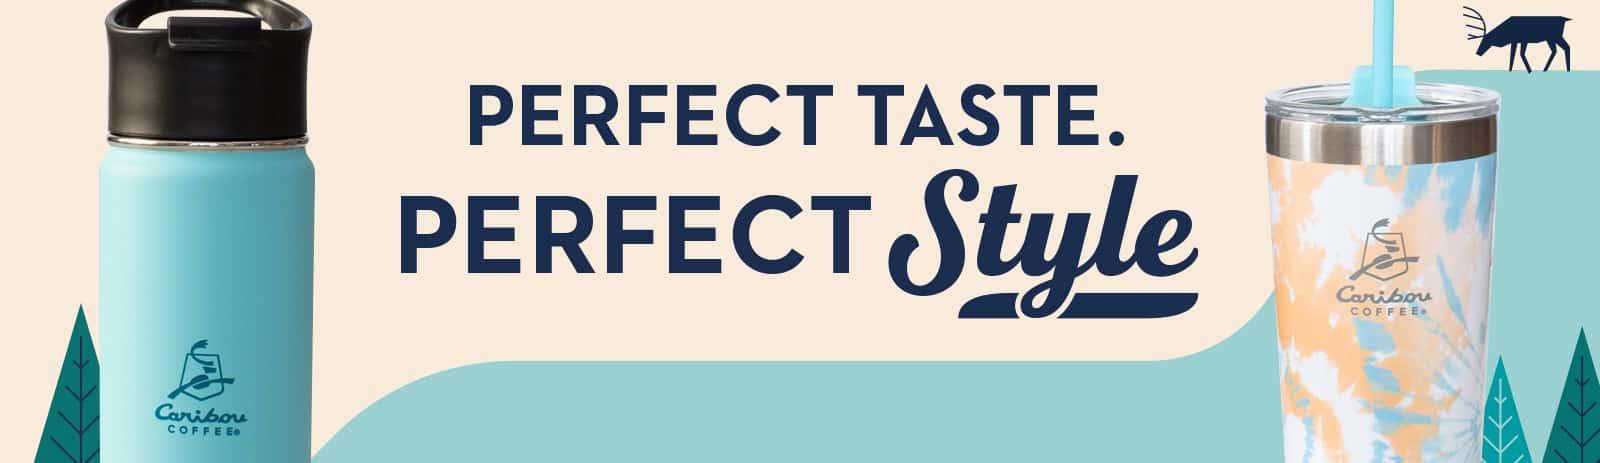 Perfect Taste. Perfect Style. No Button